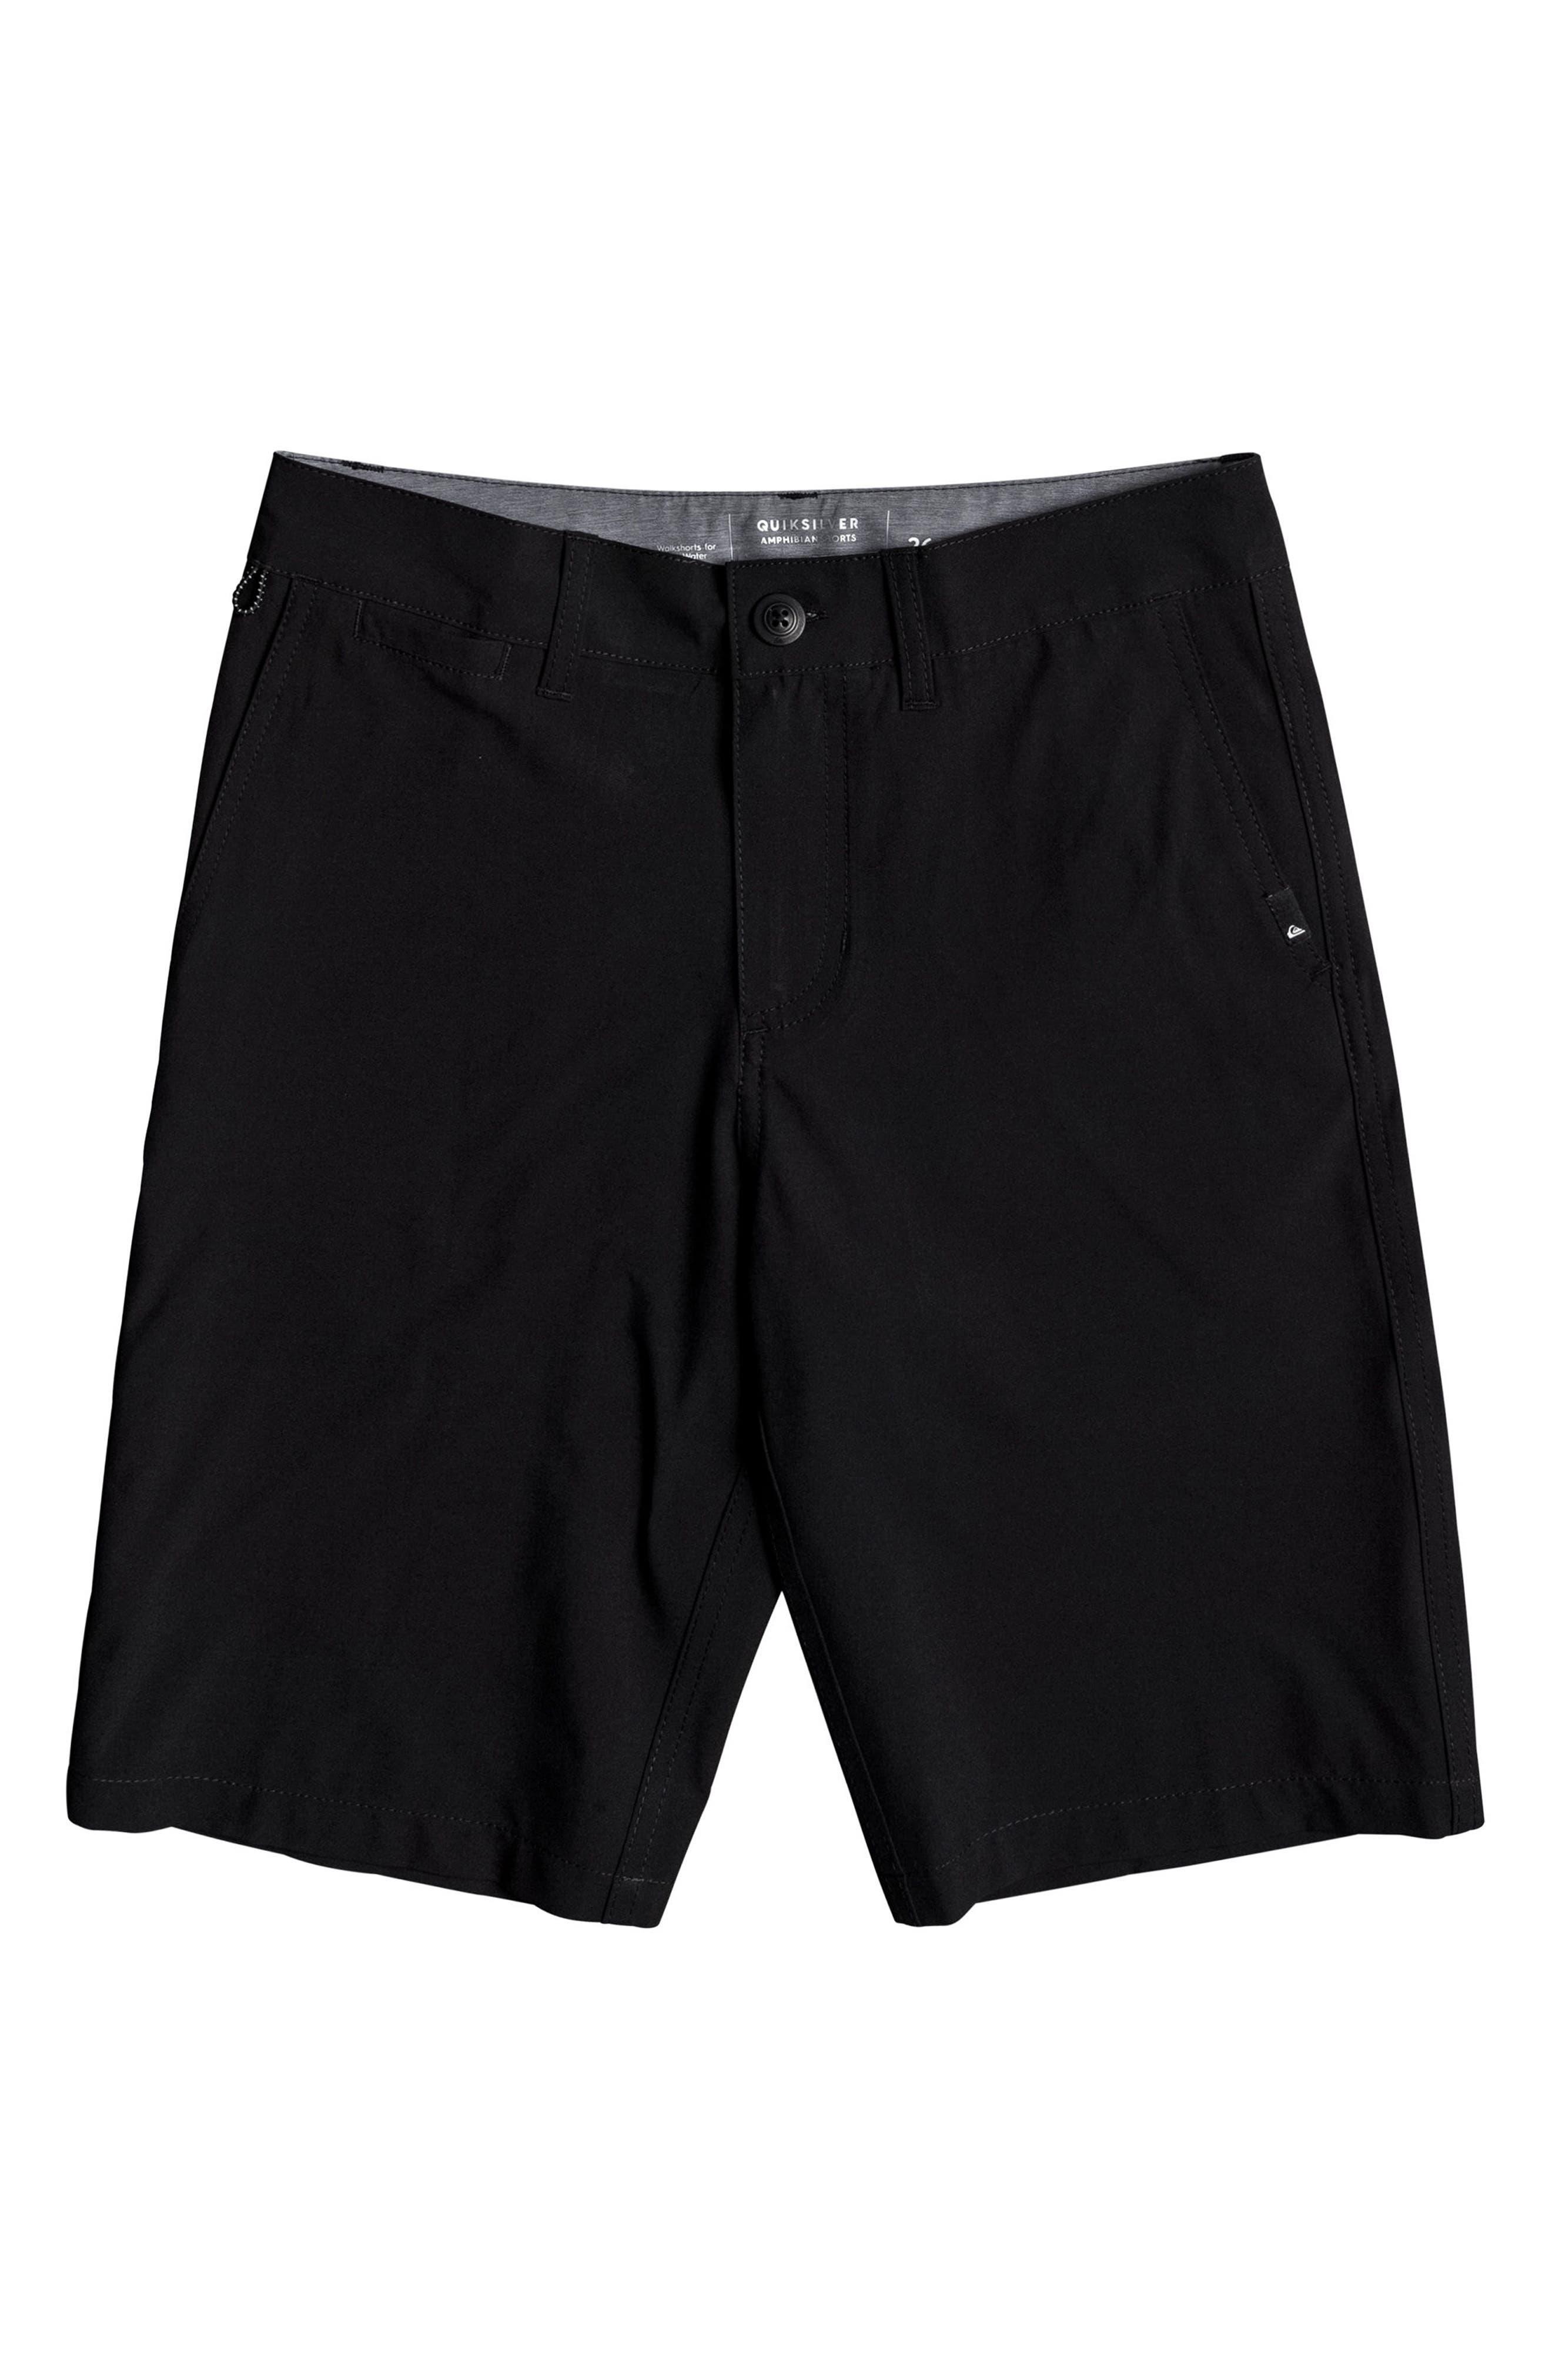 Union Amphibian Board Shorts,                             Main thumbnail 1, color,